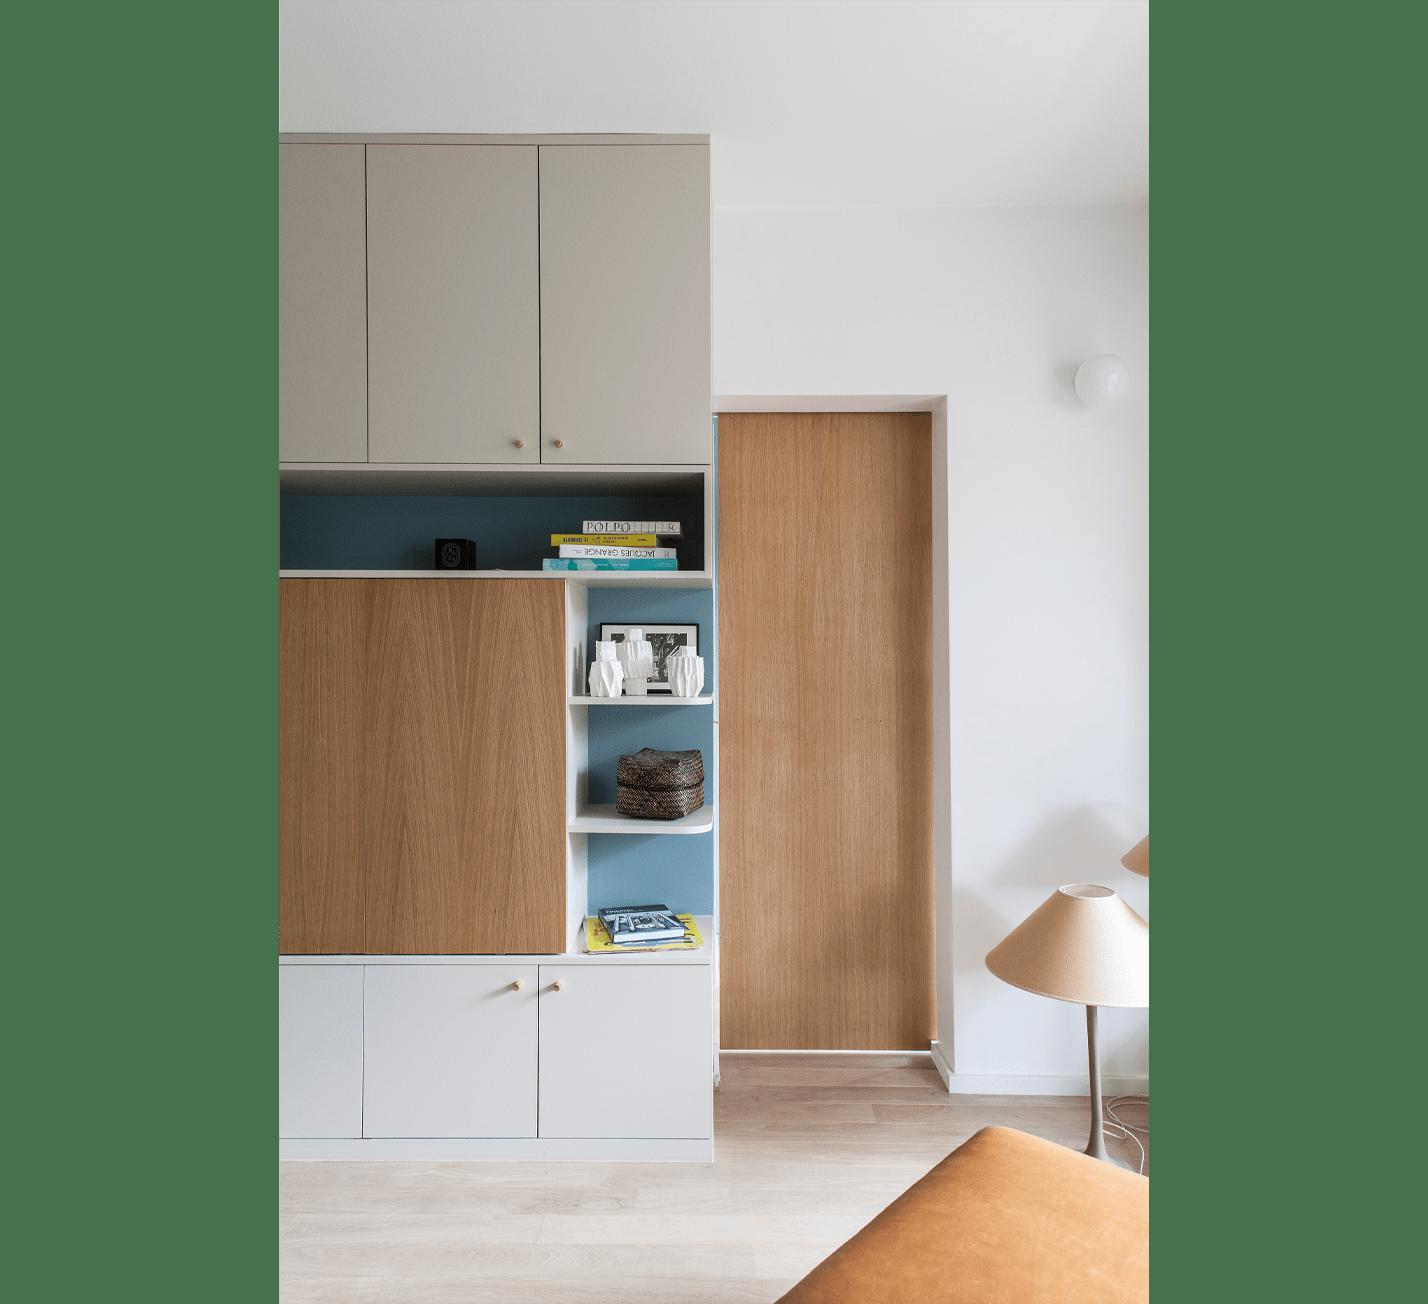 Projet-Albert-Atelier-Steve-Pauline-Borgia-Architecte-interieur-05-min-1